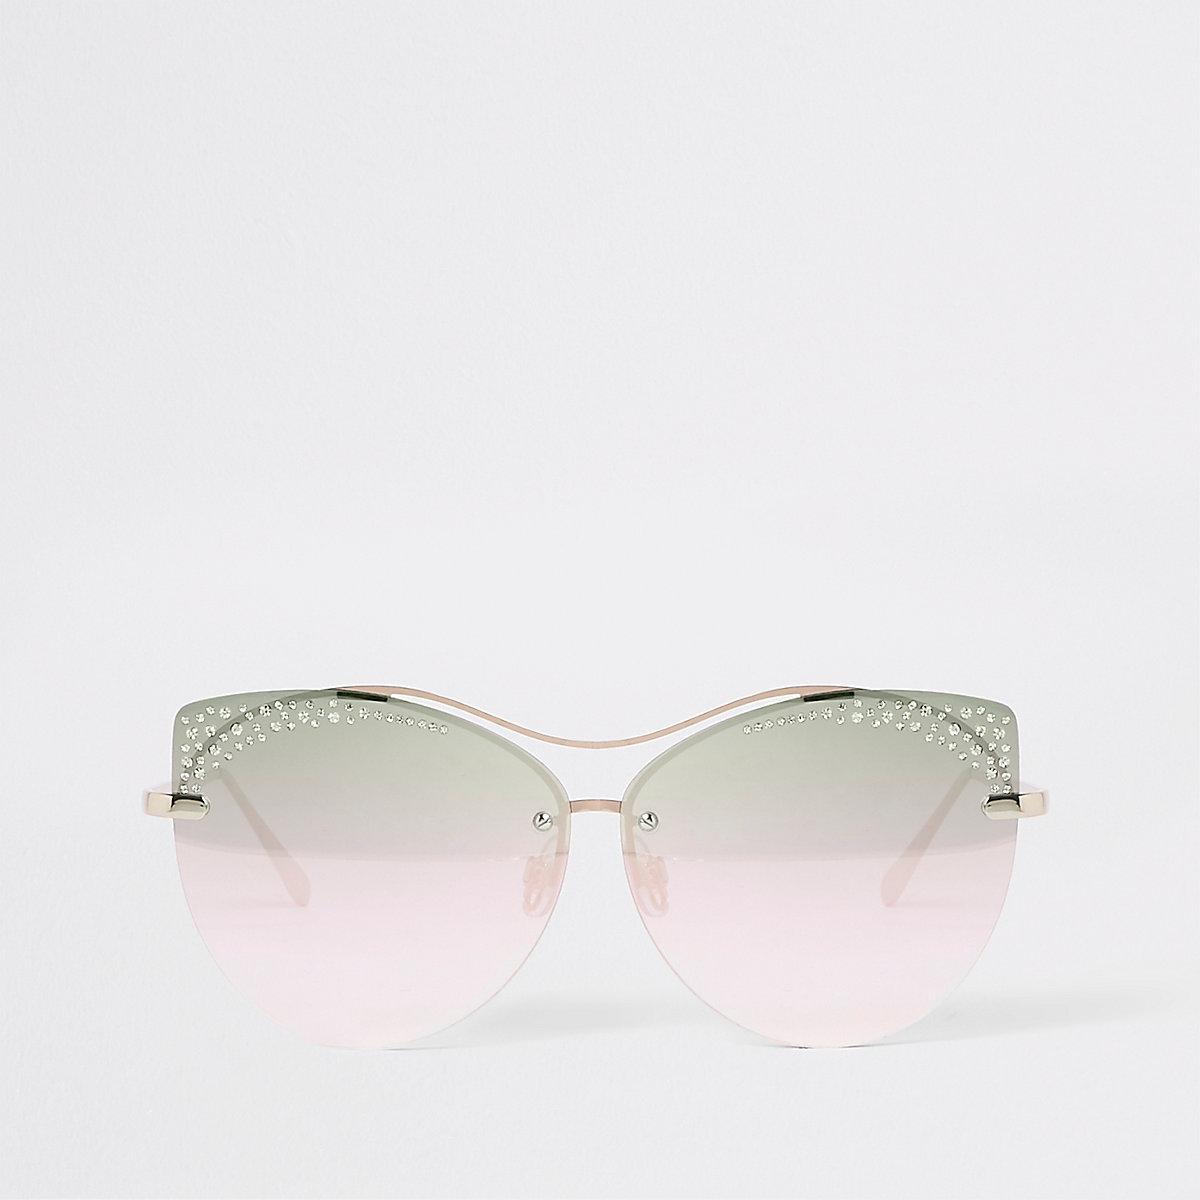 Gold tone rhinestone glam sunglasses